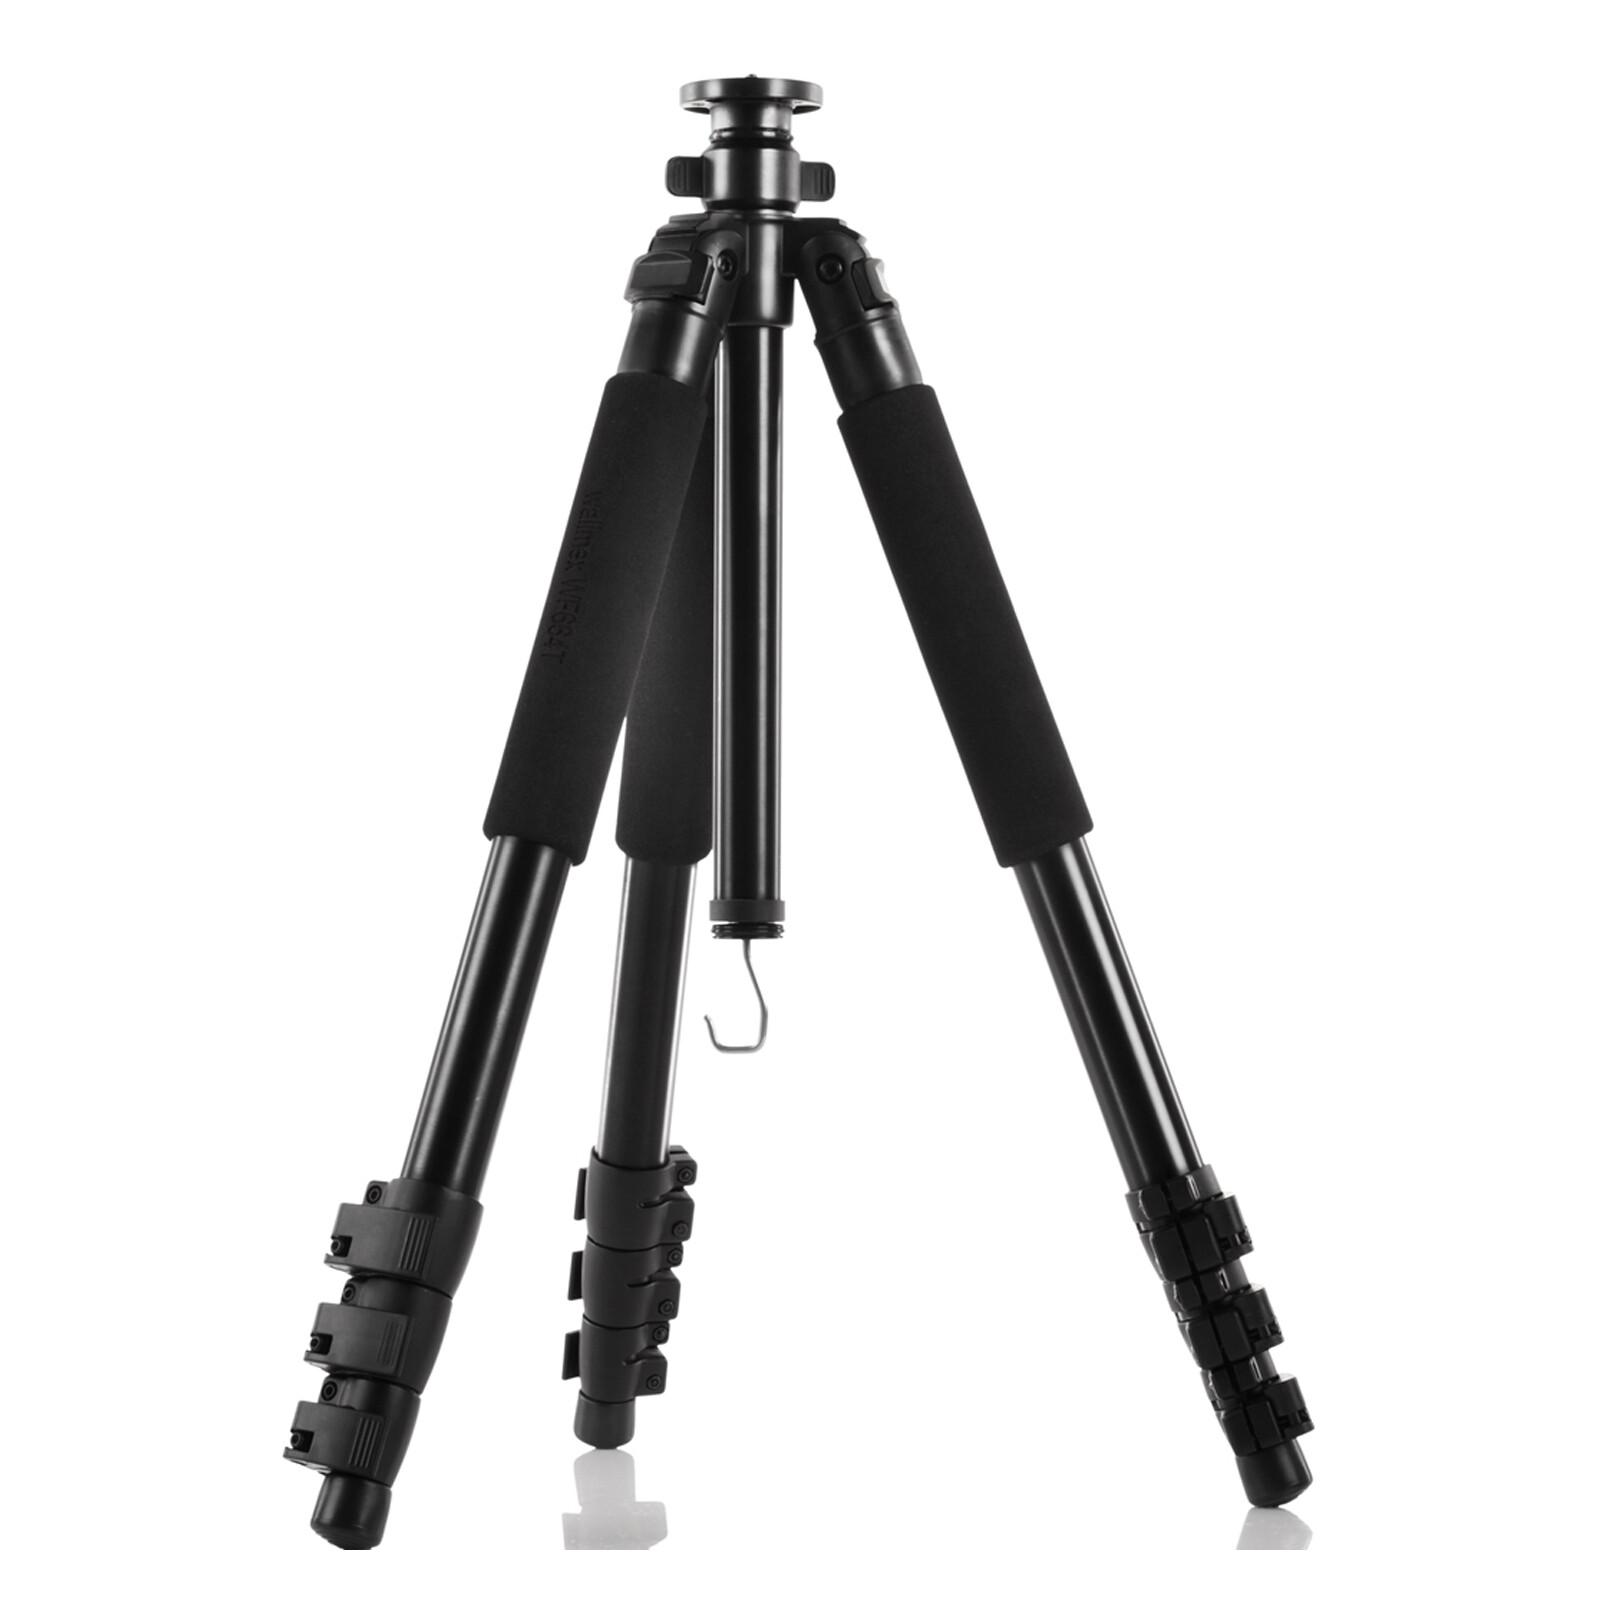 walimex pro FT-665T Stativ 185cm + Pro-3D Neiger